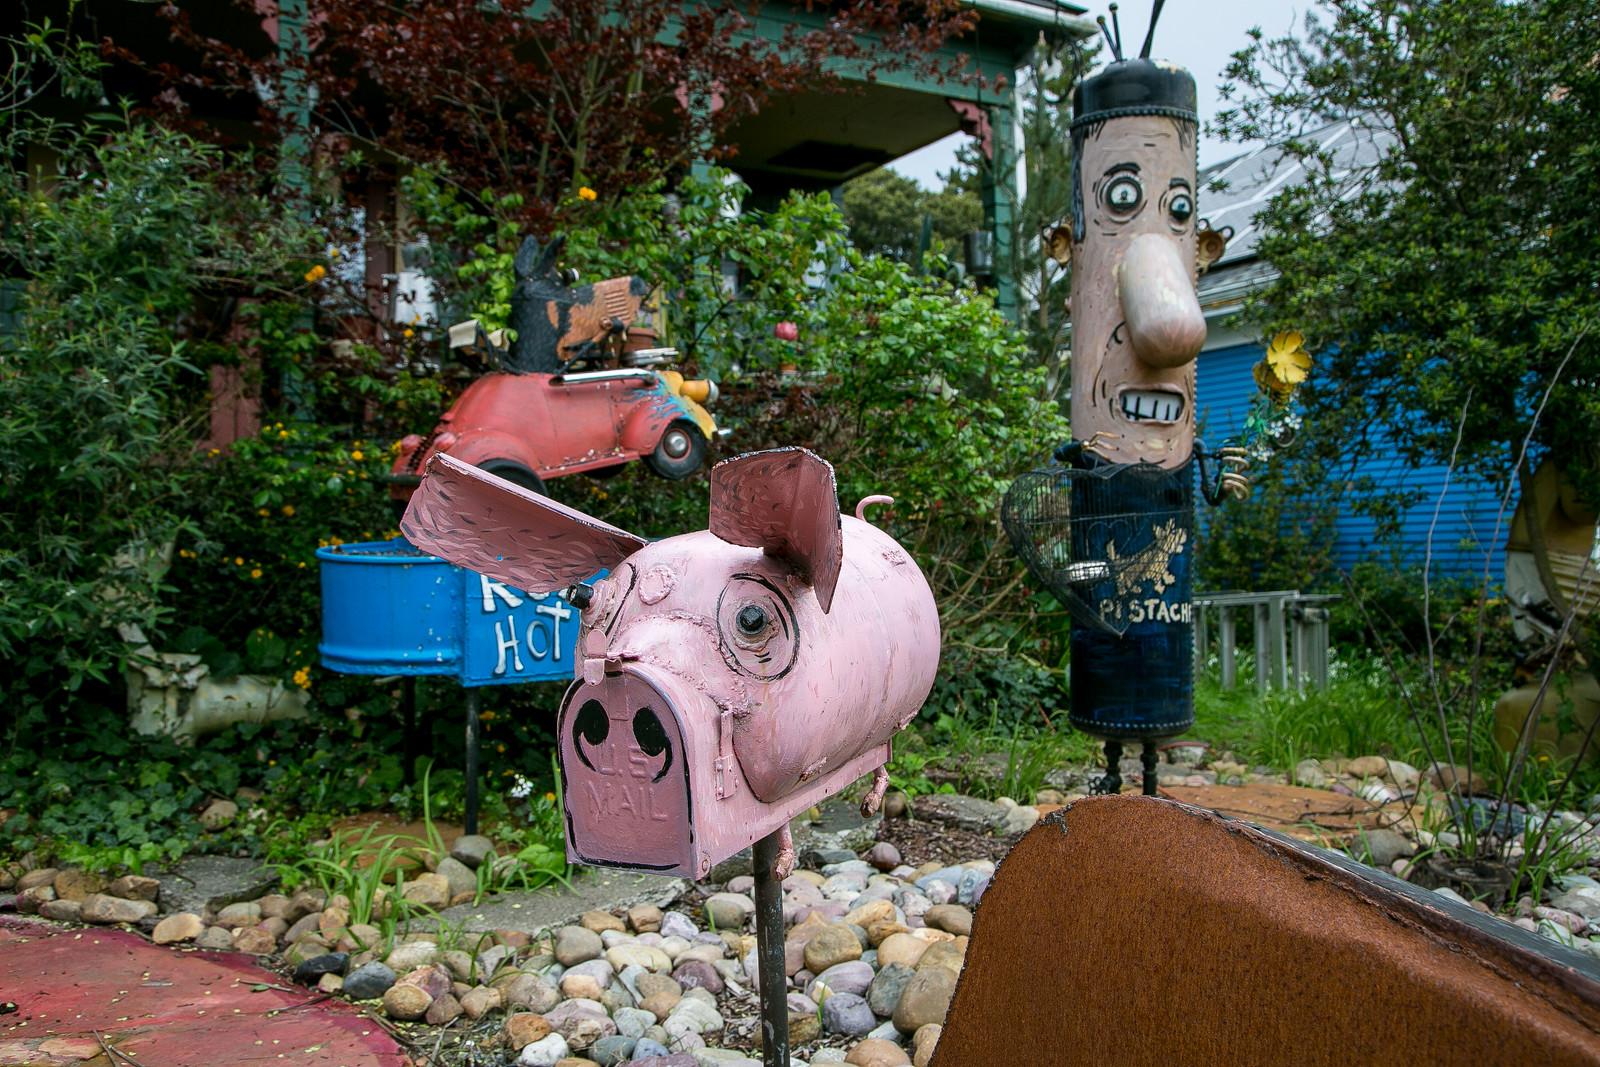 Quirky visits Sebastopol